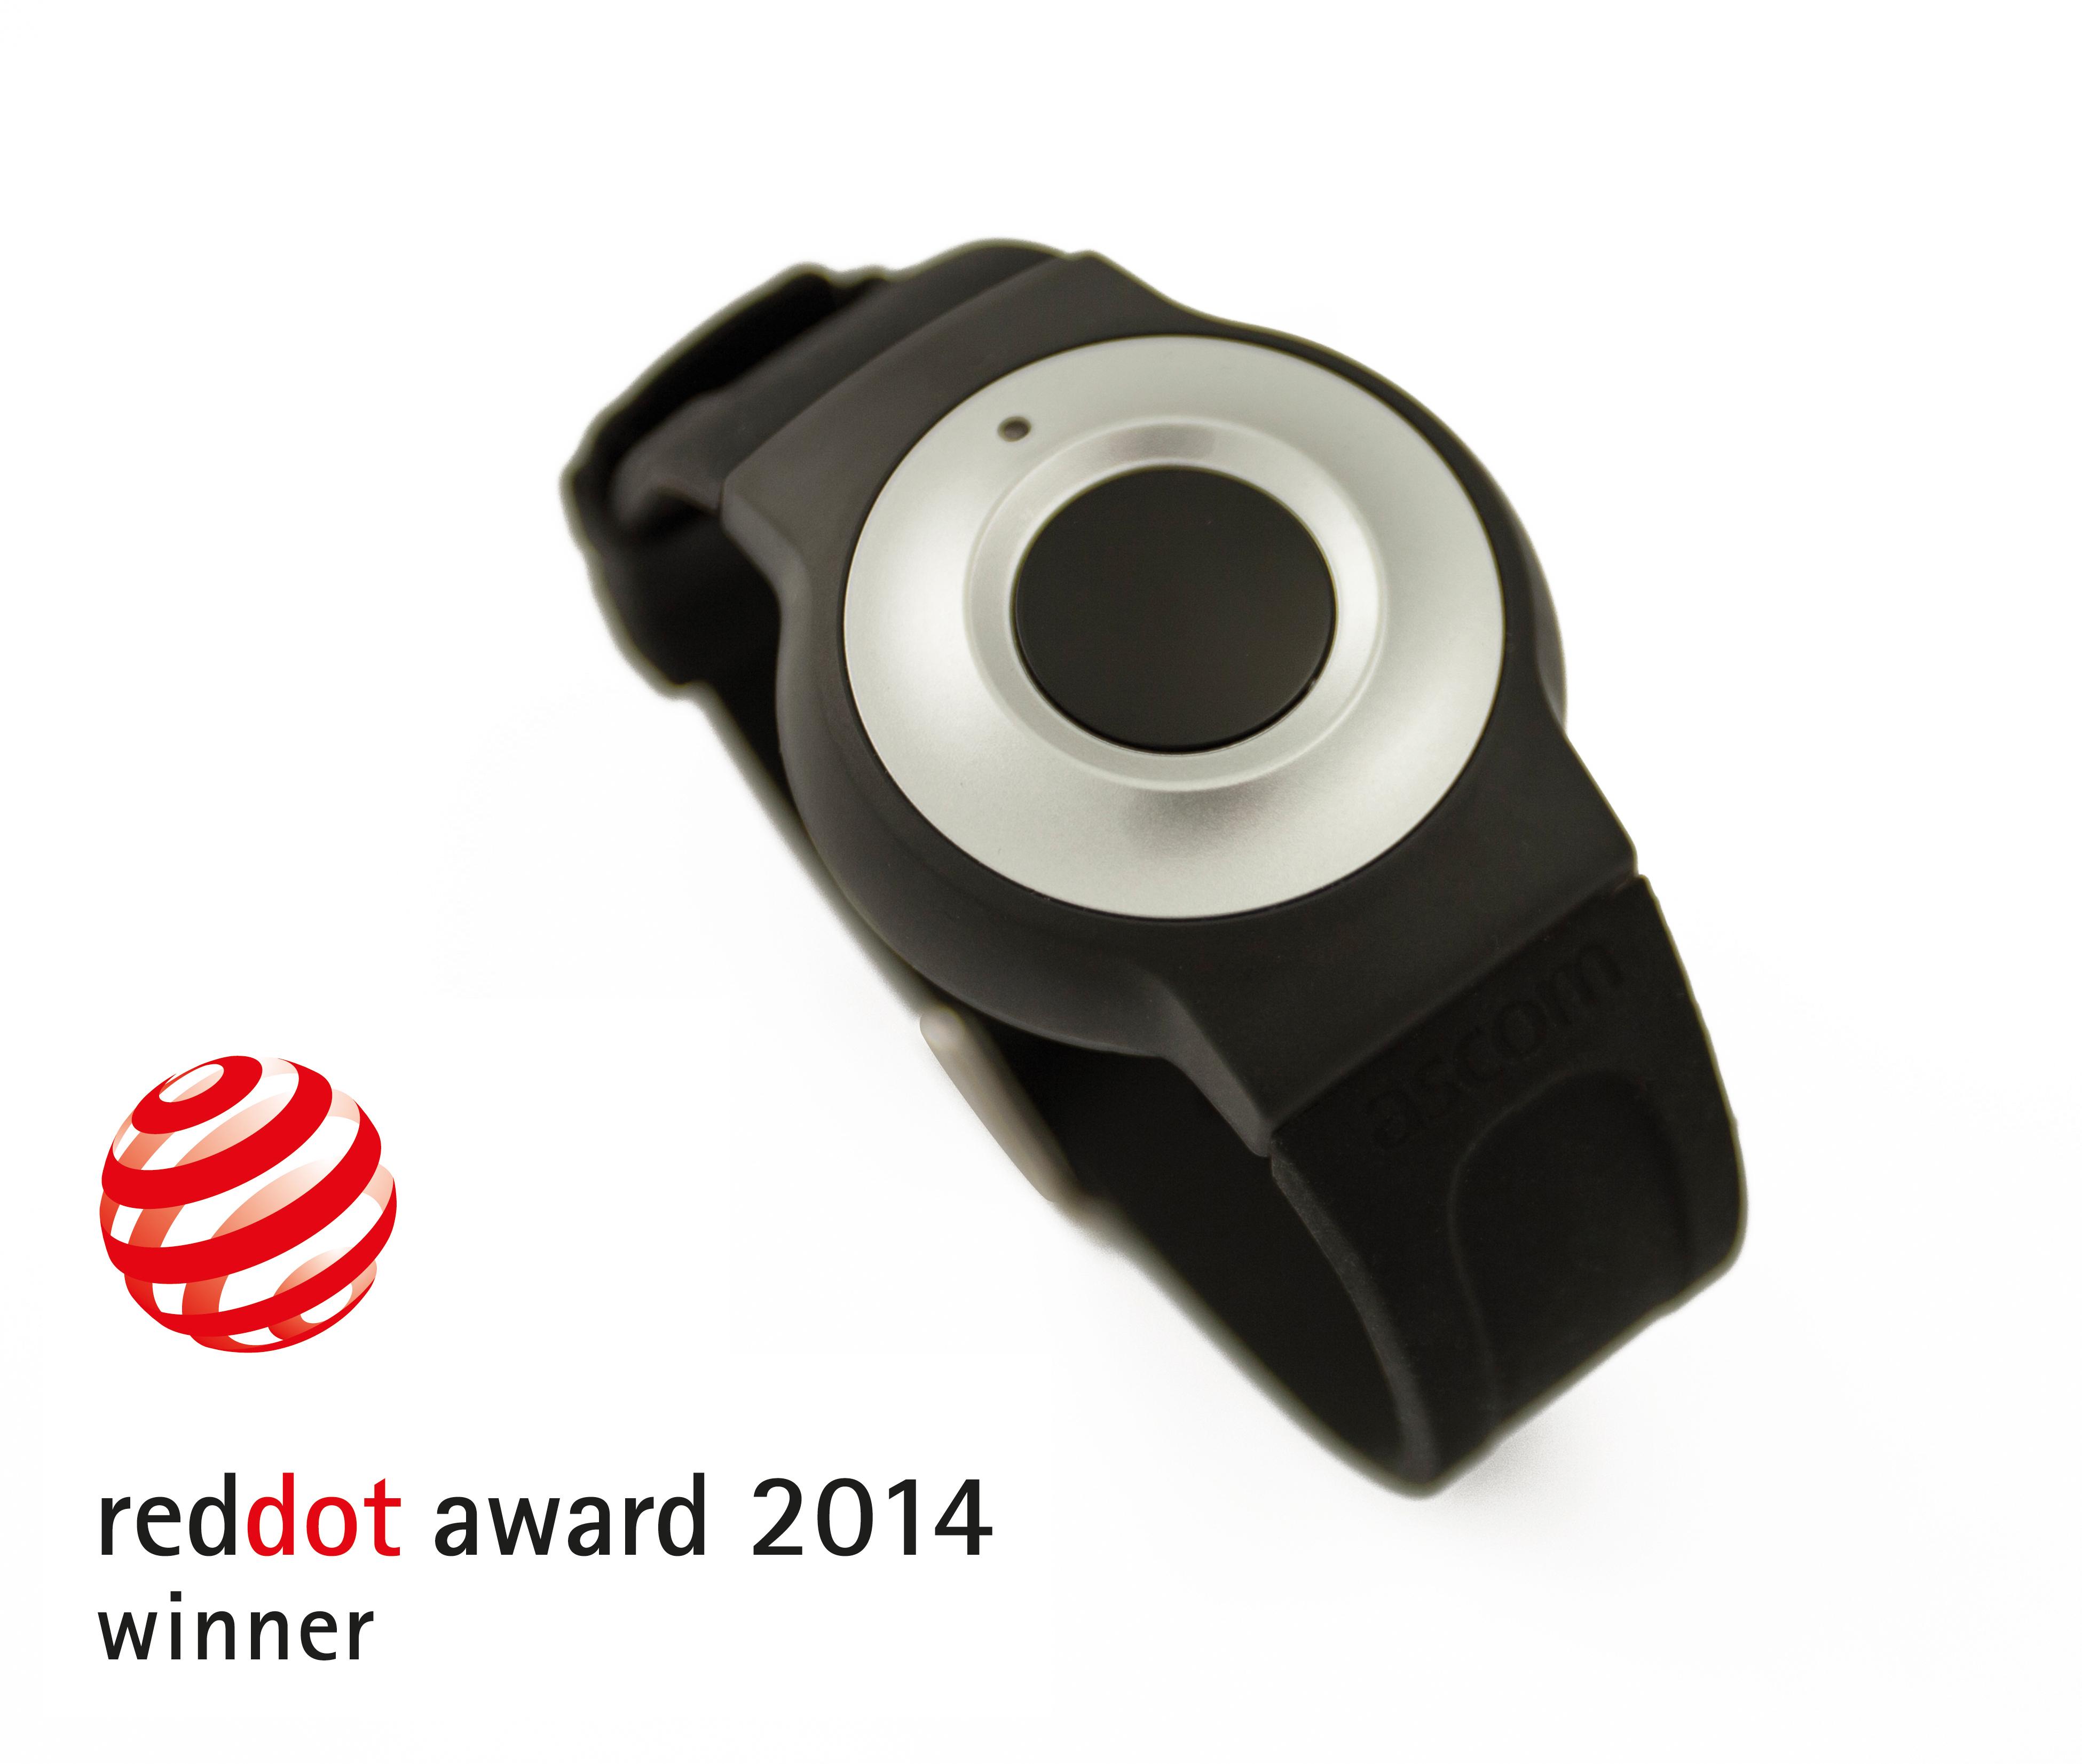 ascom erh lt den red dot award 2014 f r einen neuen drahtlosen alarm transceiver f r. Black Bedroom Furniture Sets. Home Design Ideas